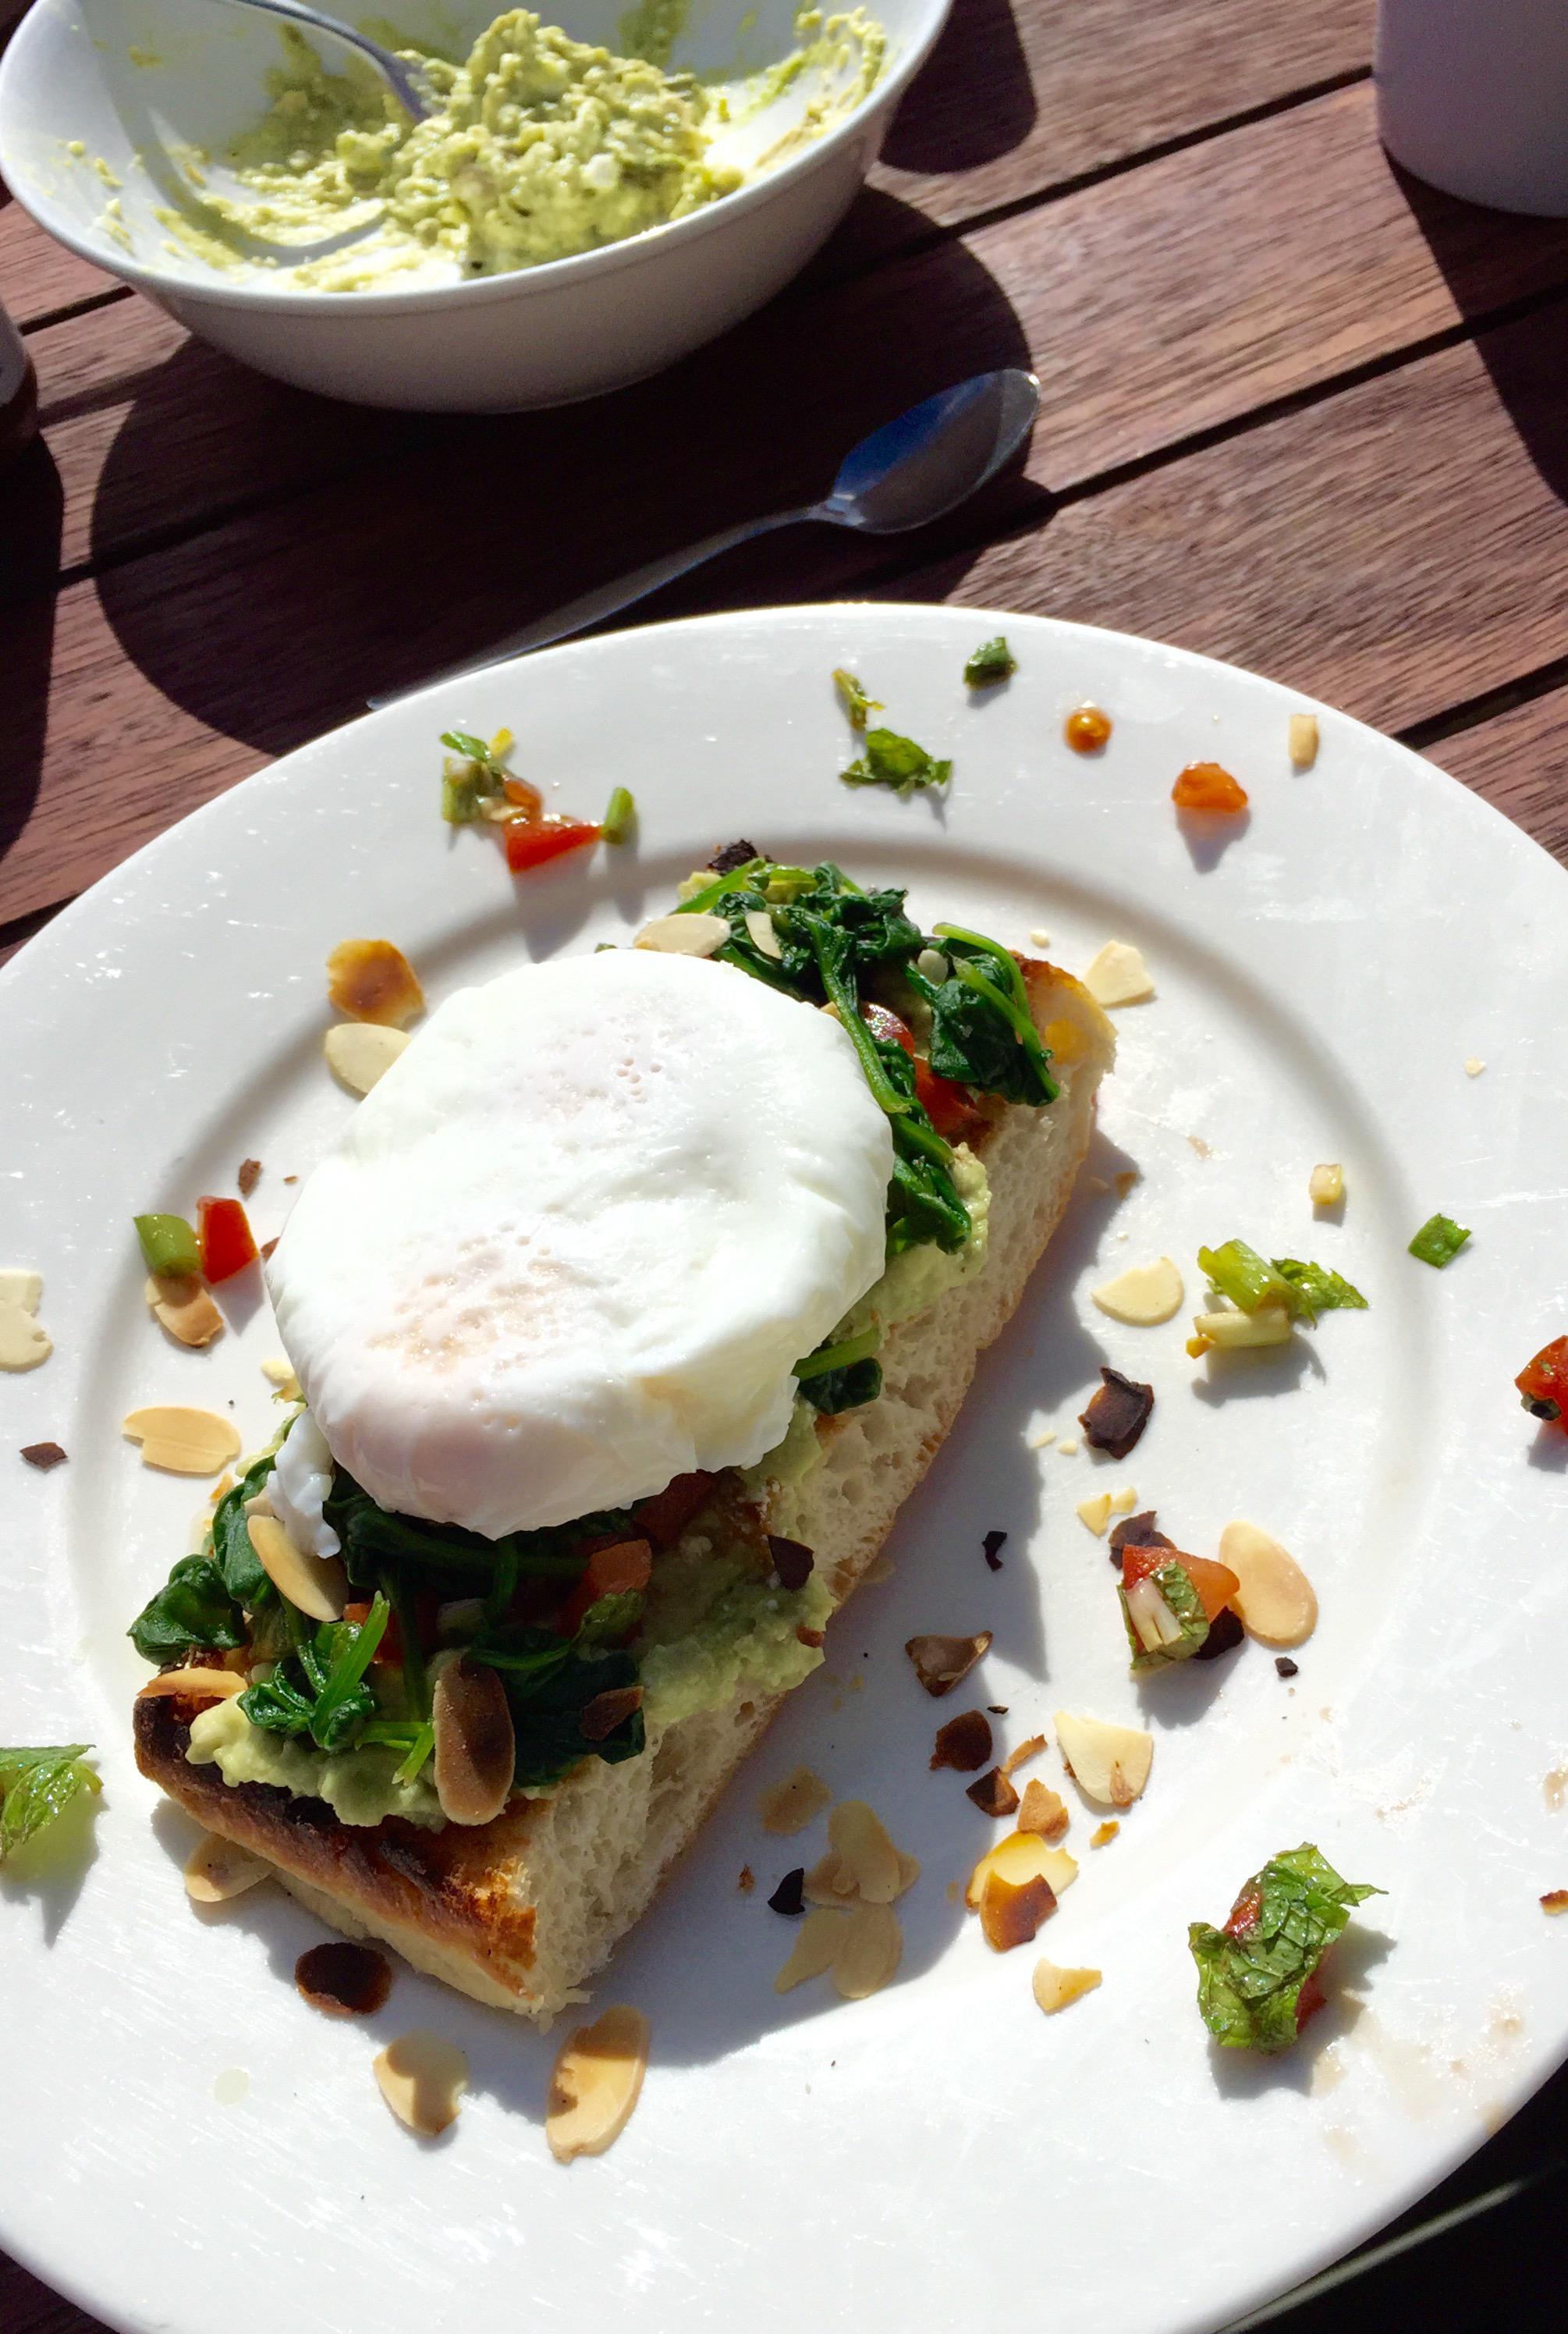 tomaten, rezept tomaten, Gesundes Frühstück, gesund ernähren, gesunde Zutaten, gesund frühstücken Rezept, schnelles und gesundes Frühstück